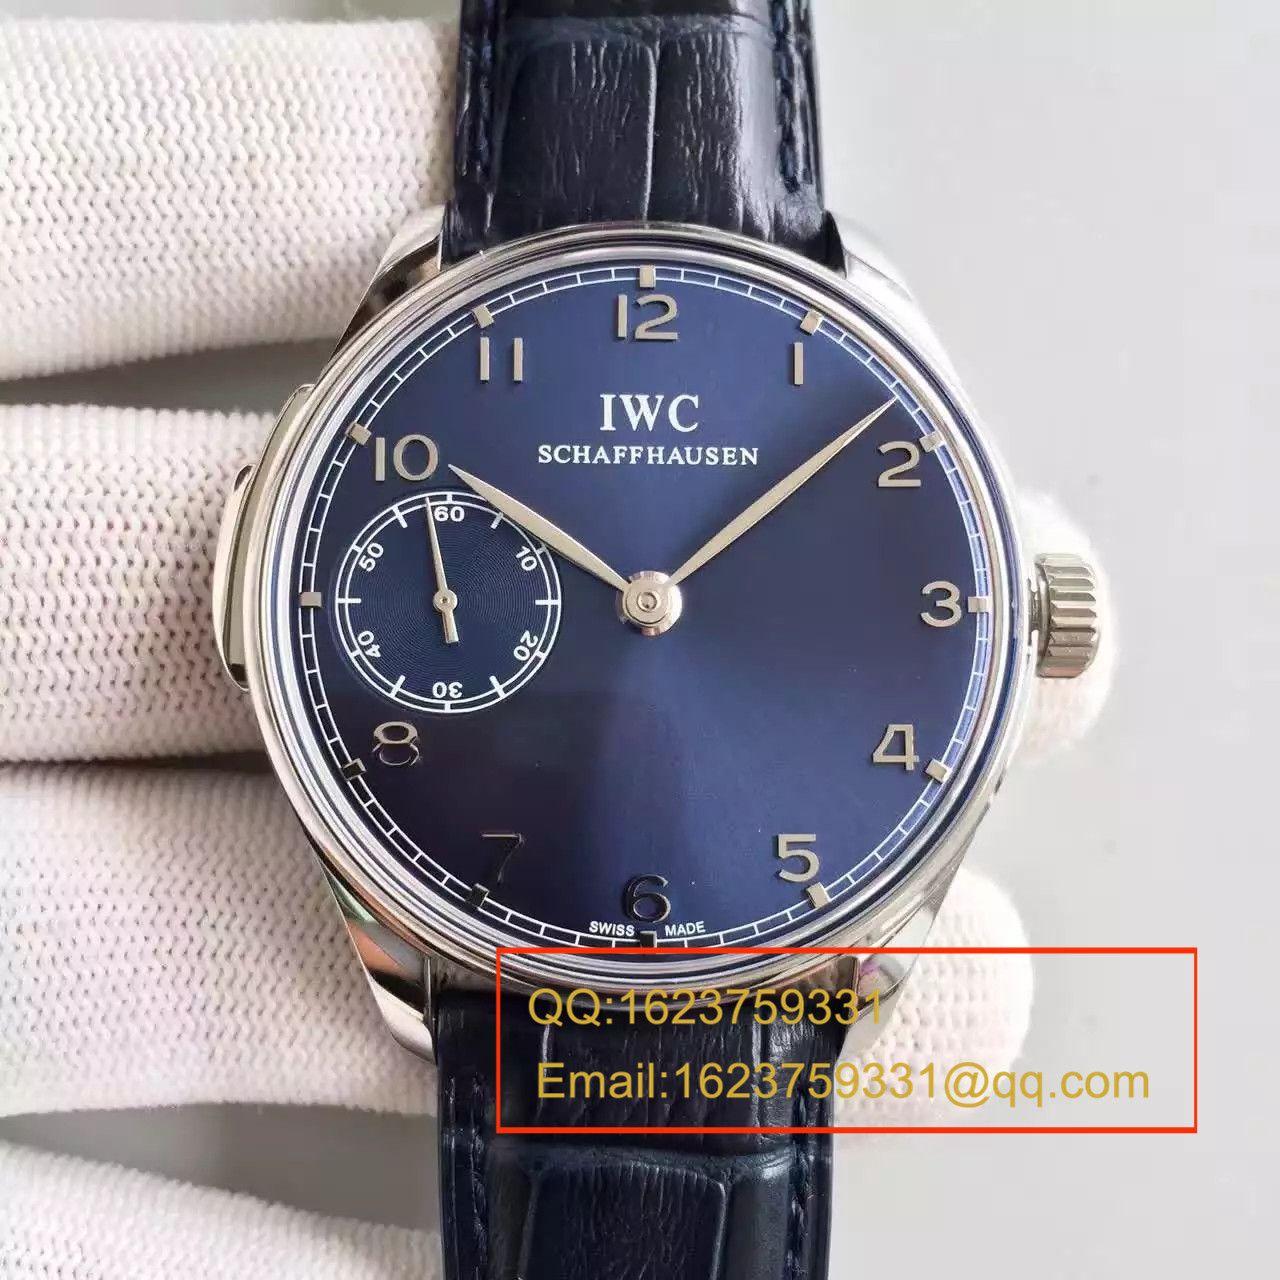 【YL厂顶级复刻手表】万国葡萄牙系列IW524204《万国三问》腕表 / WG235